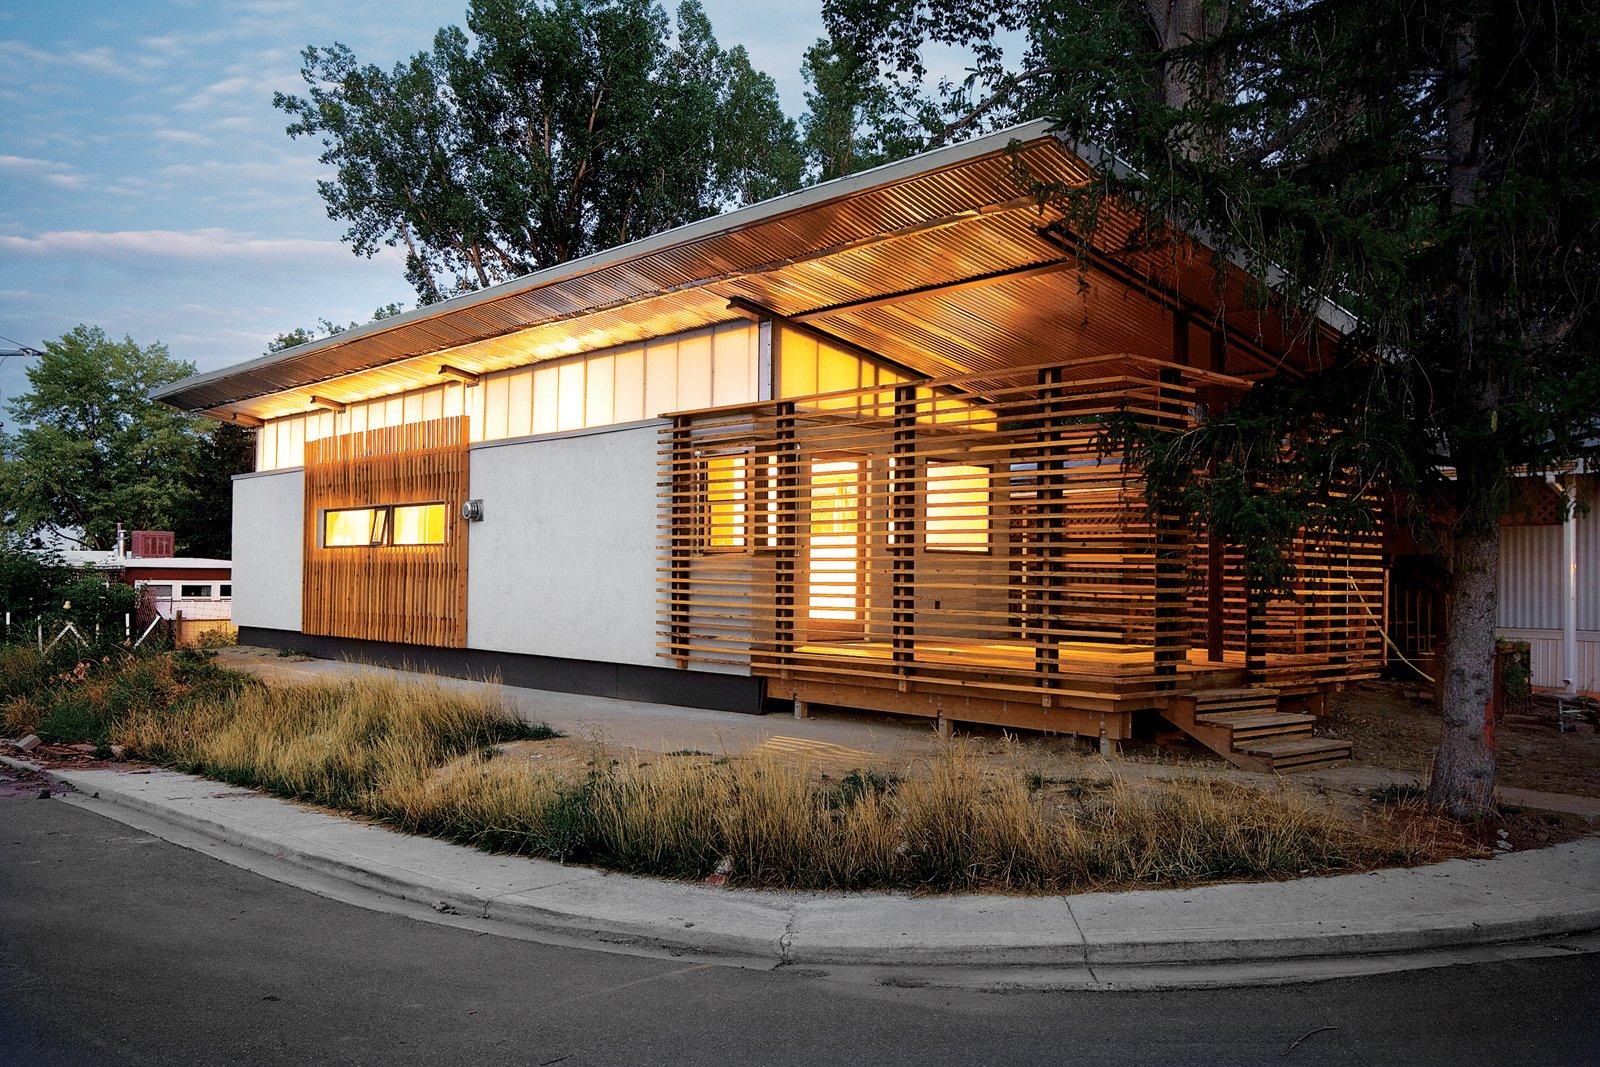 Best Kitchen Gallery: 6 Modern Modular Homes We Love In Colorado Dwell of Modular Home Modern  on rachelxblog.com